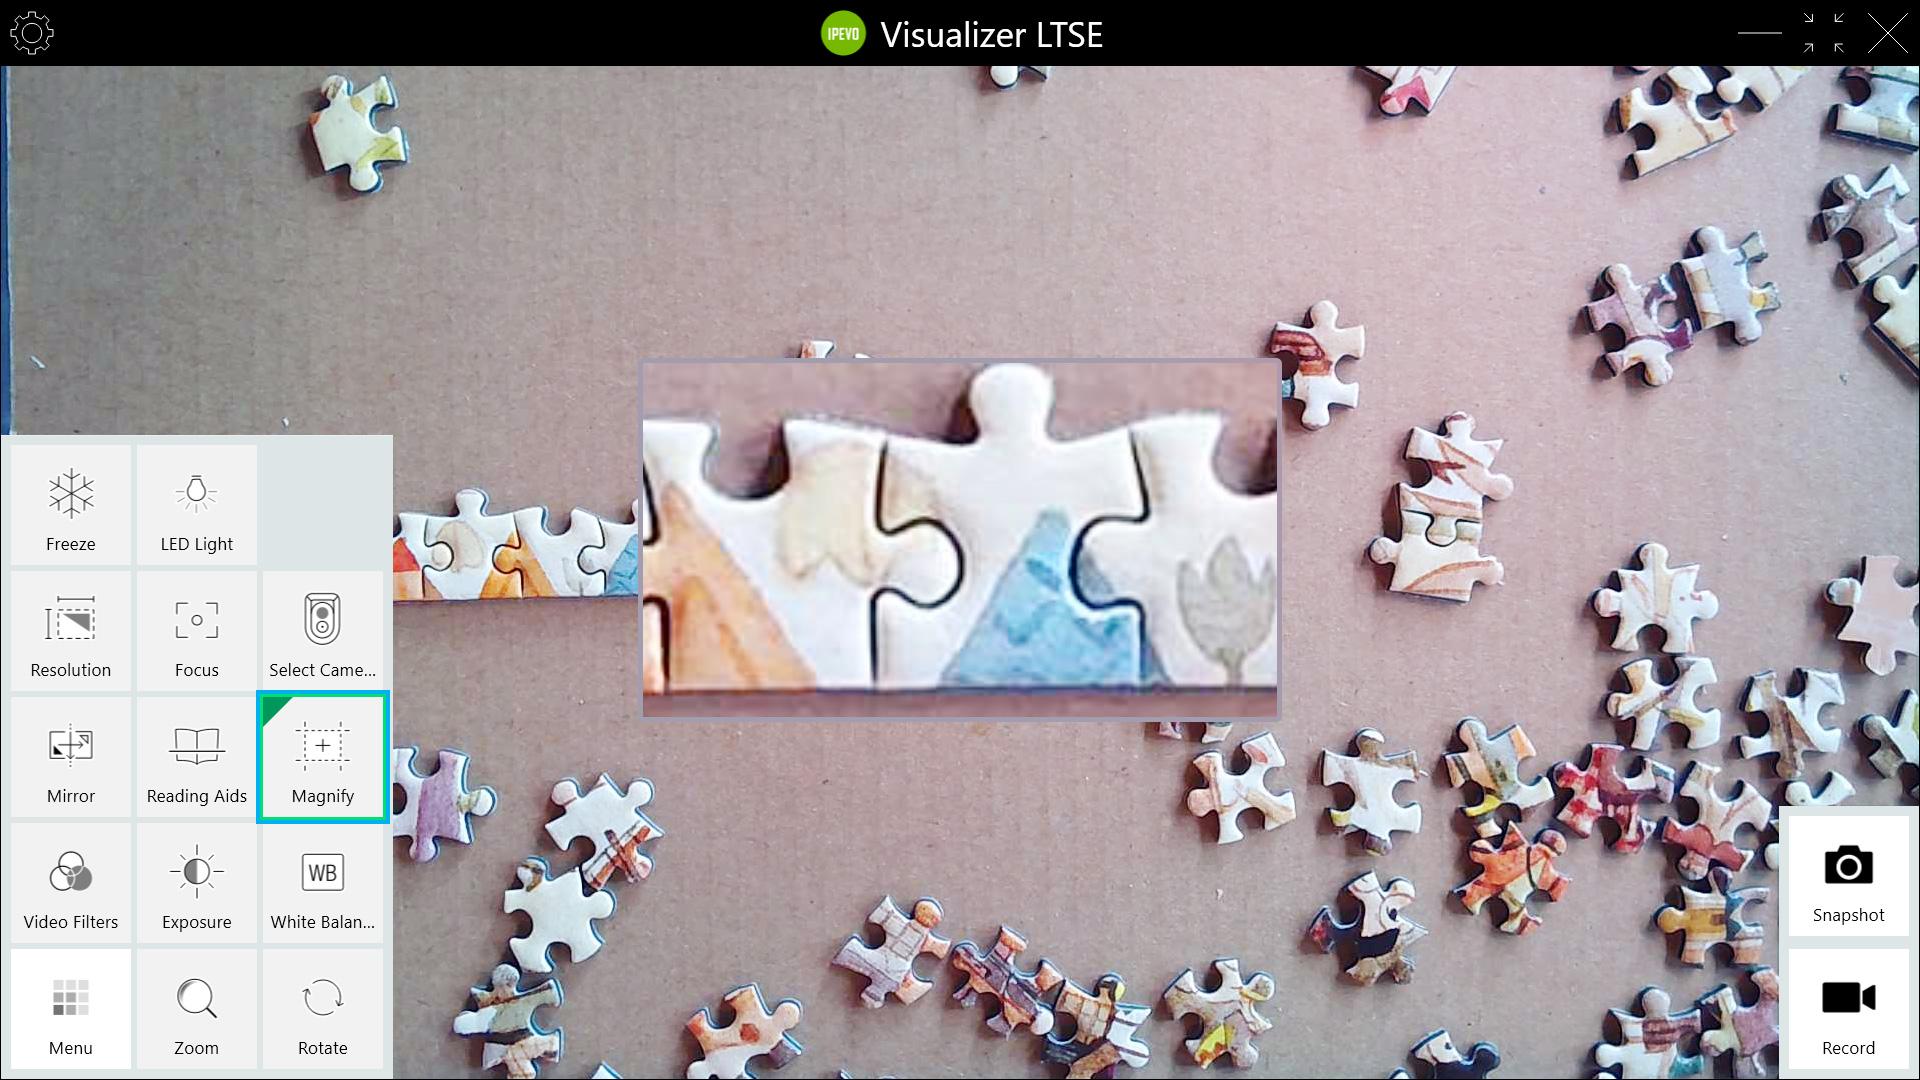 IPEVO Visualizer-LTSE for Windows